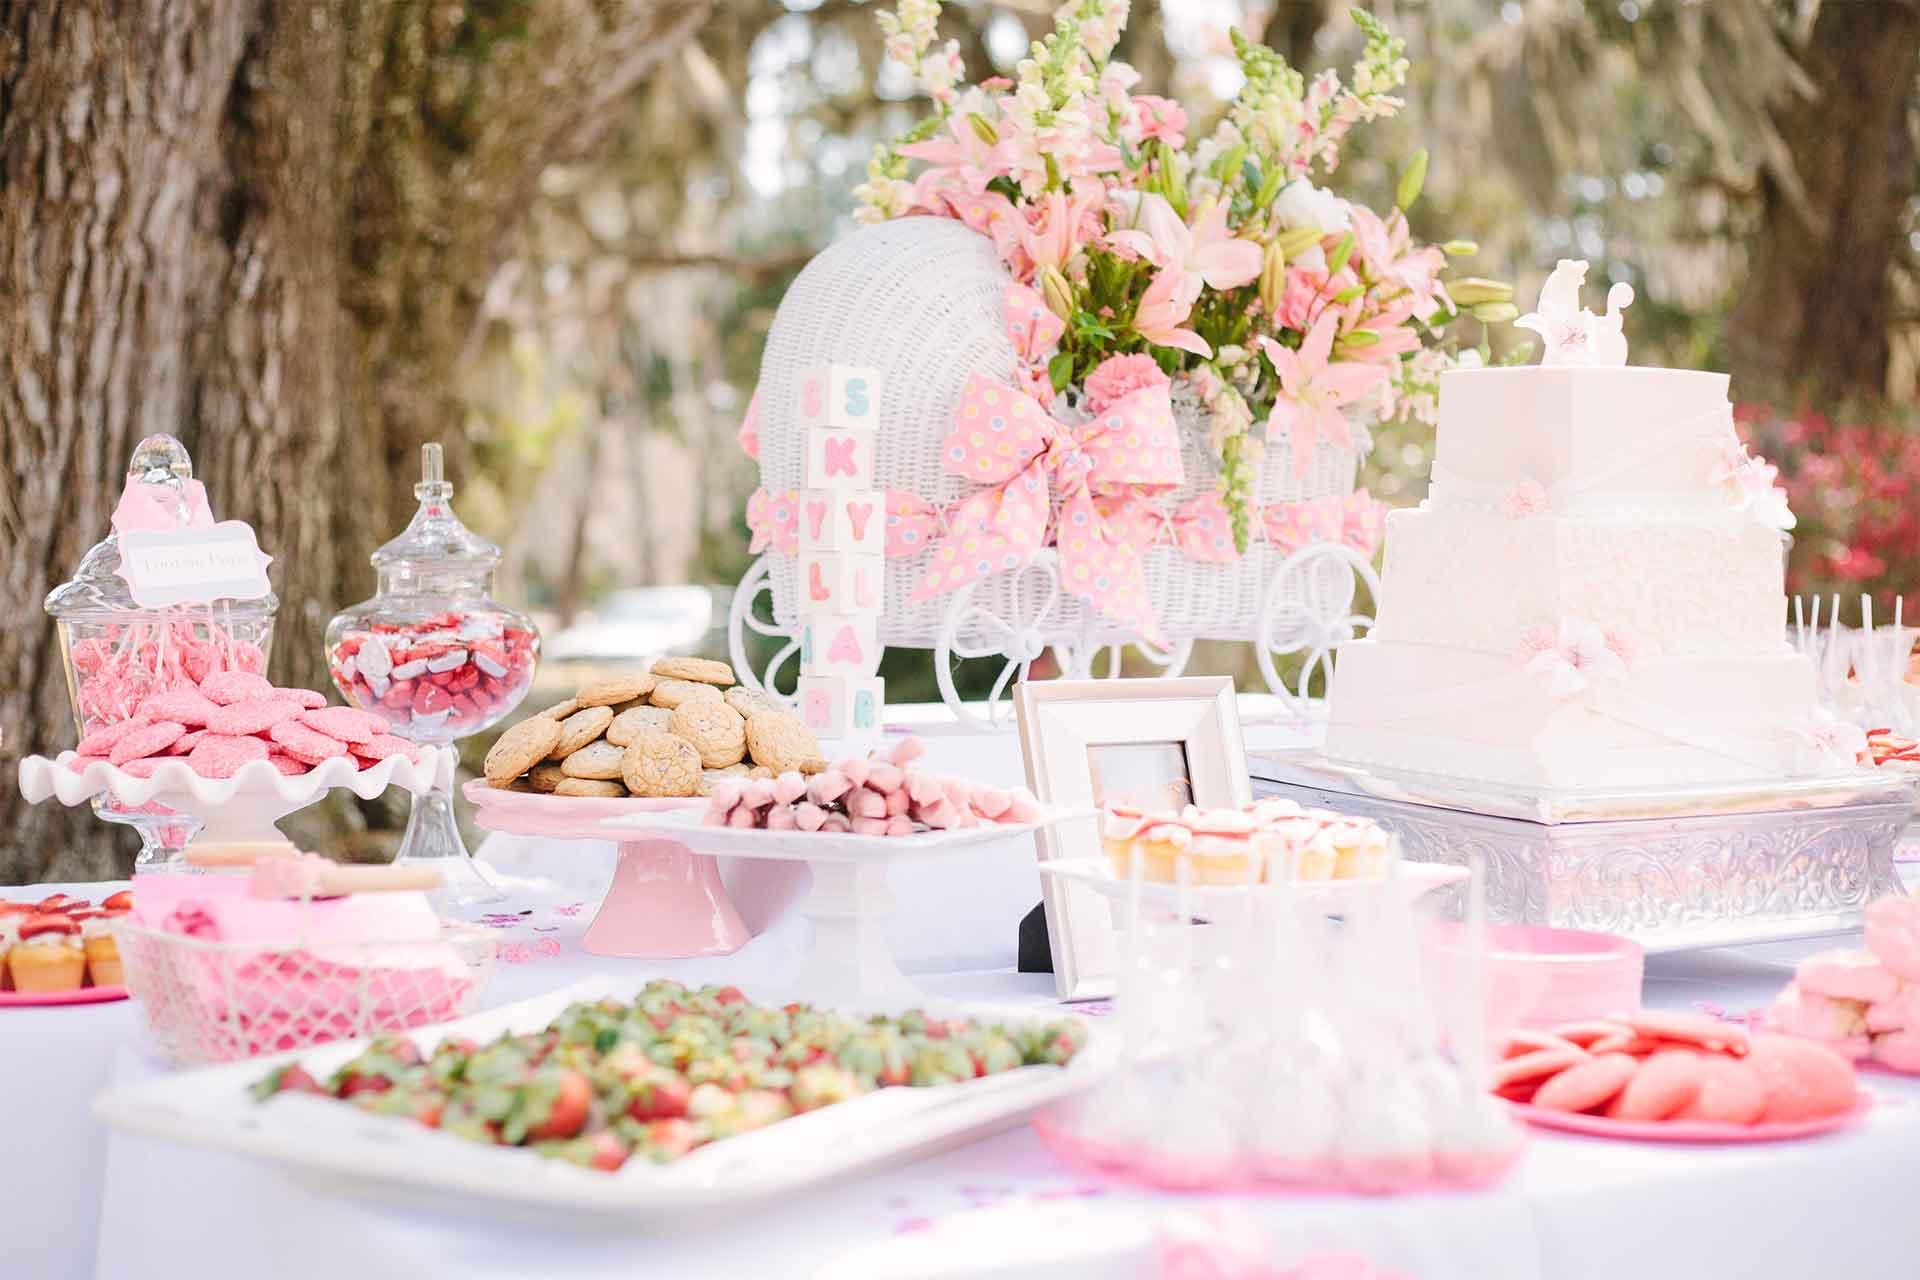 Inchiriere Decoratiuni Nunta Si Evenimente Speciale